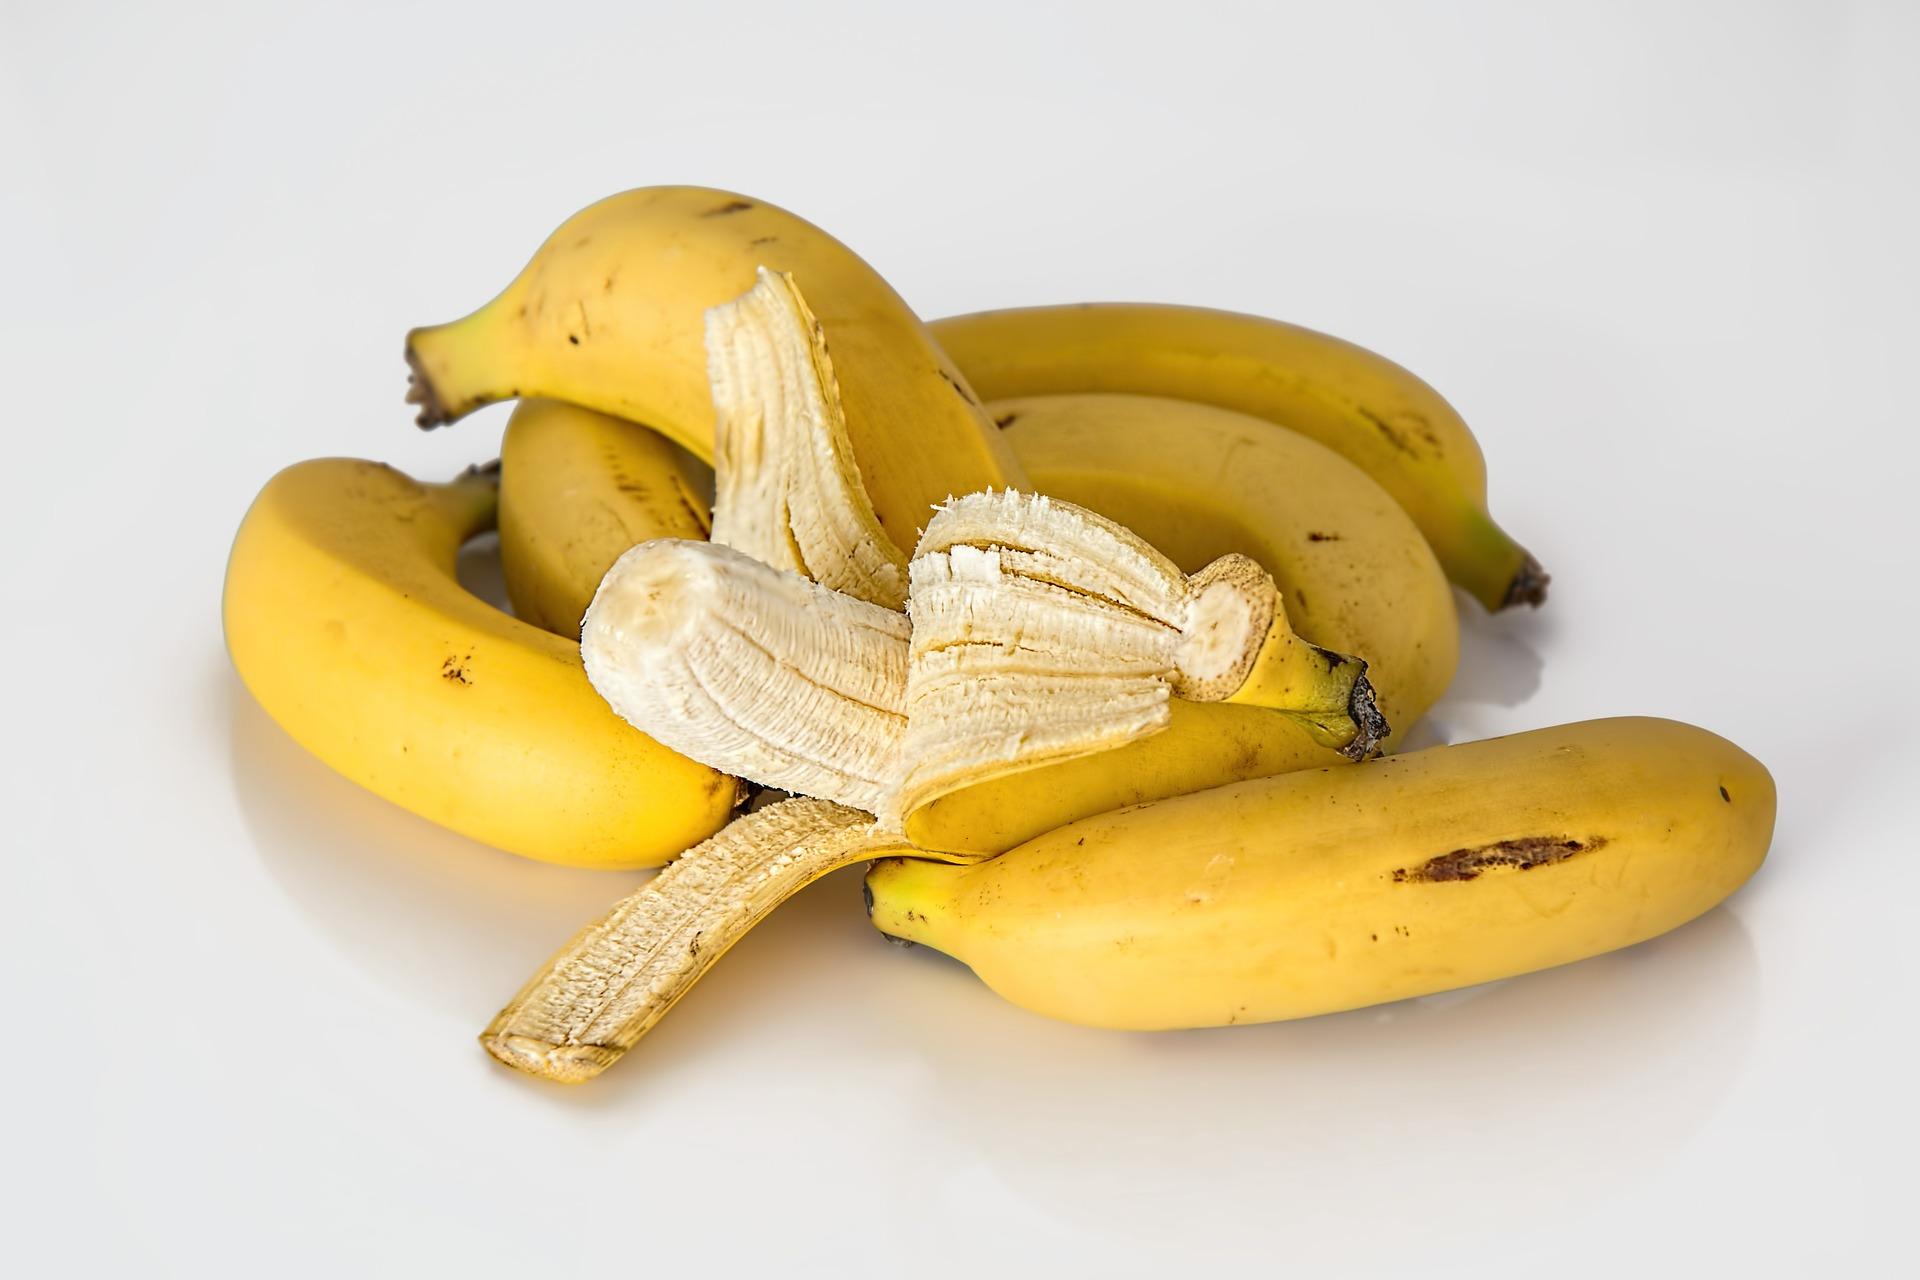 banana-614090_1920.jpg